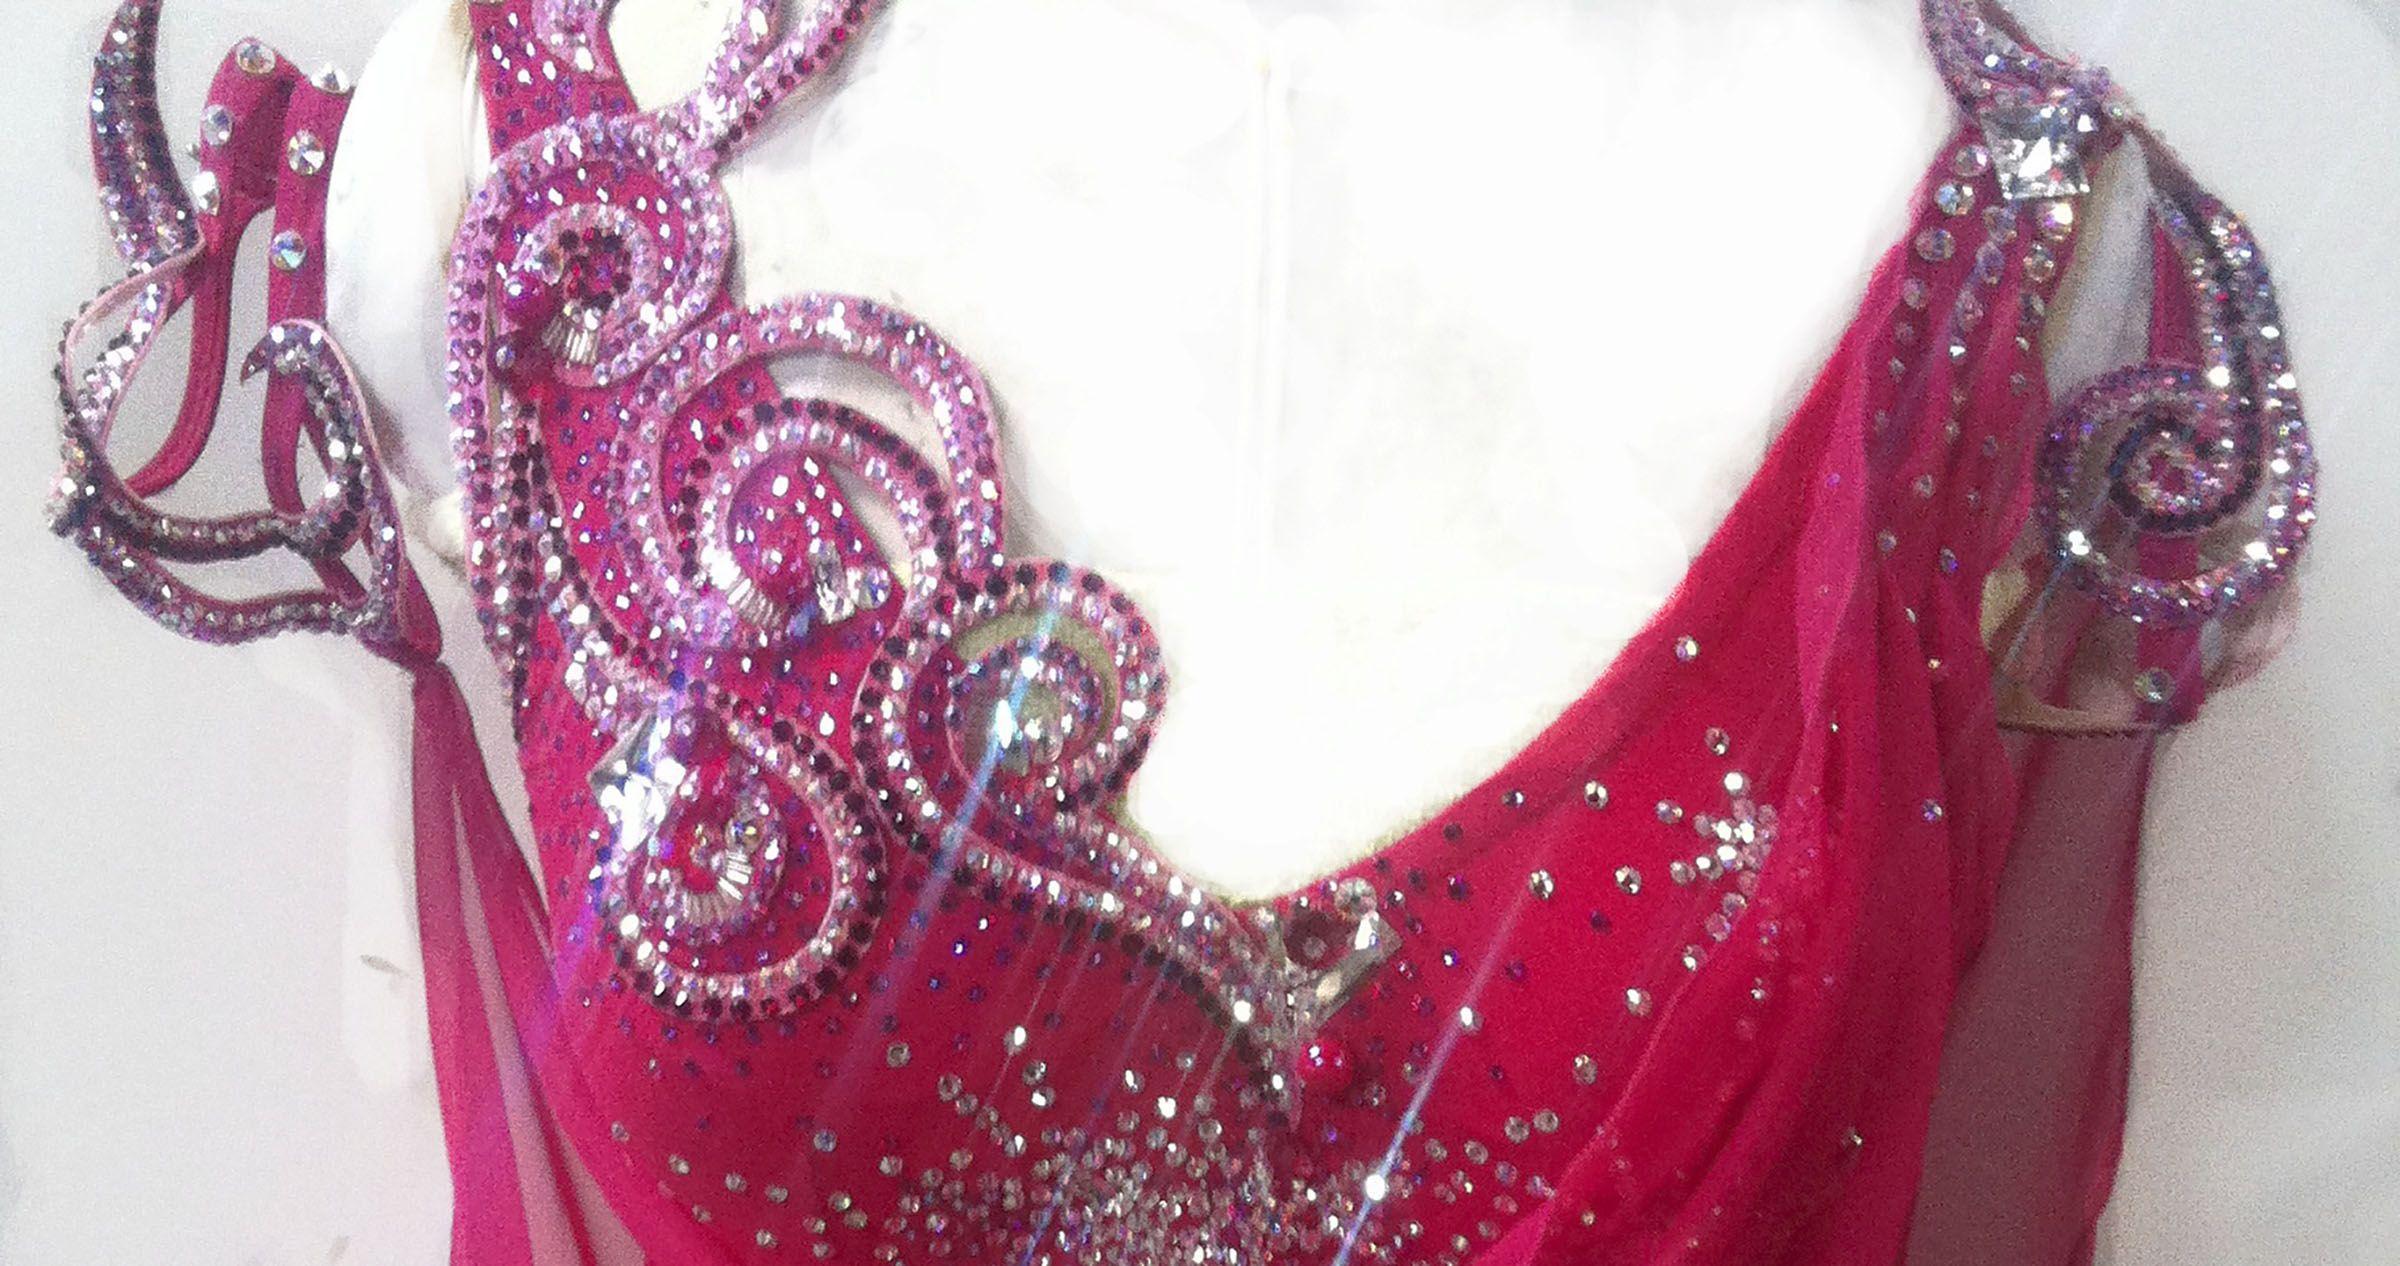 Pink latin ballroom dance dress